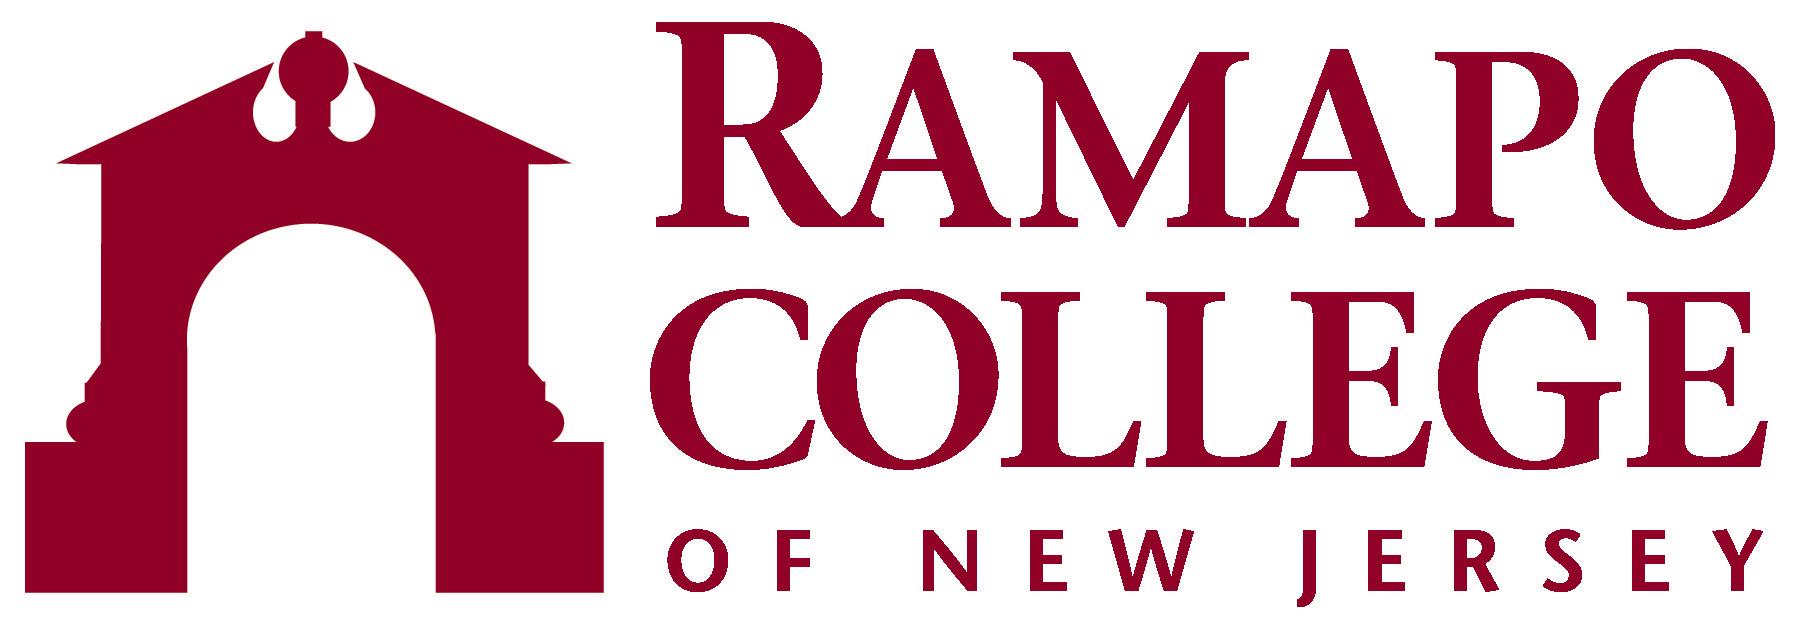 ramapo college logo